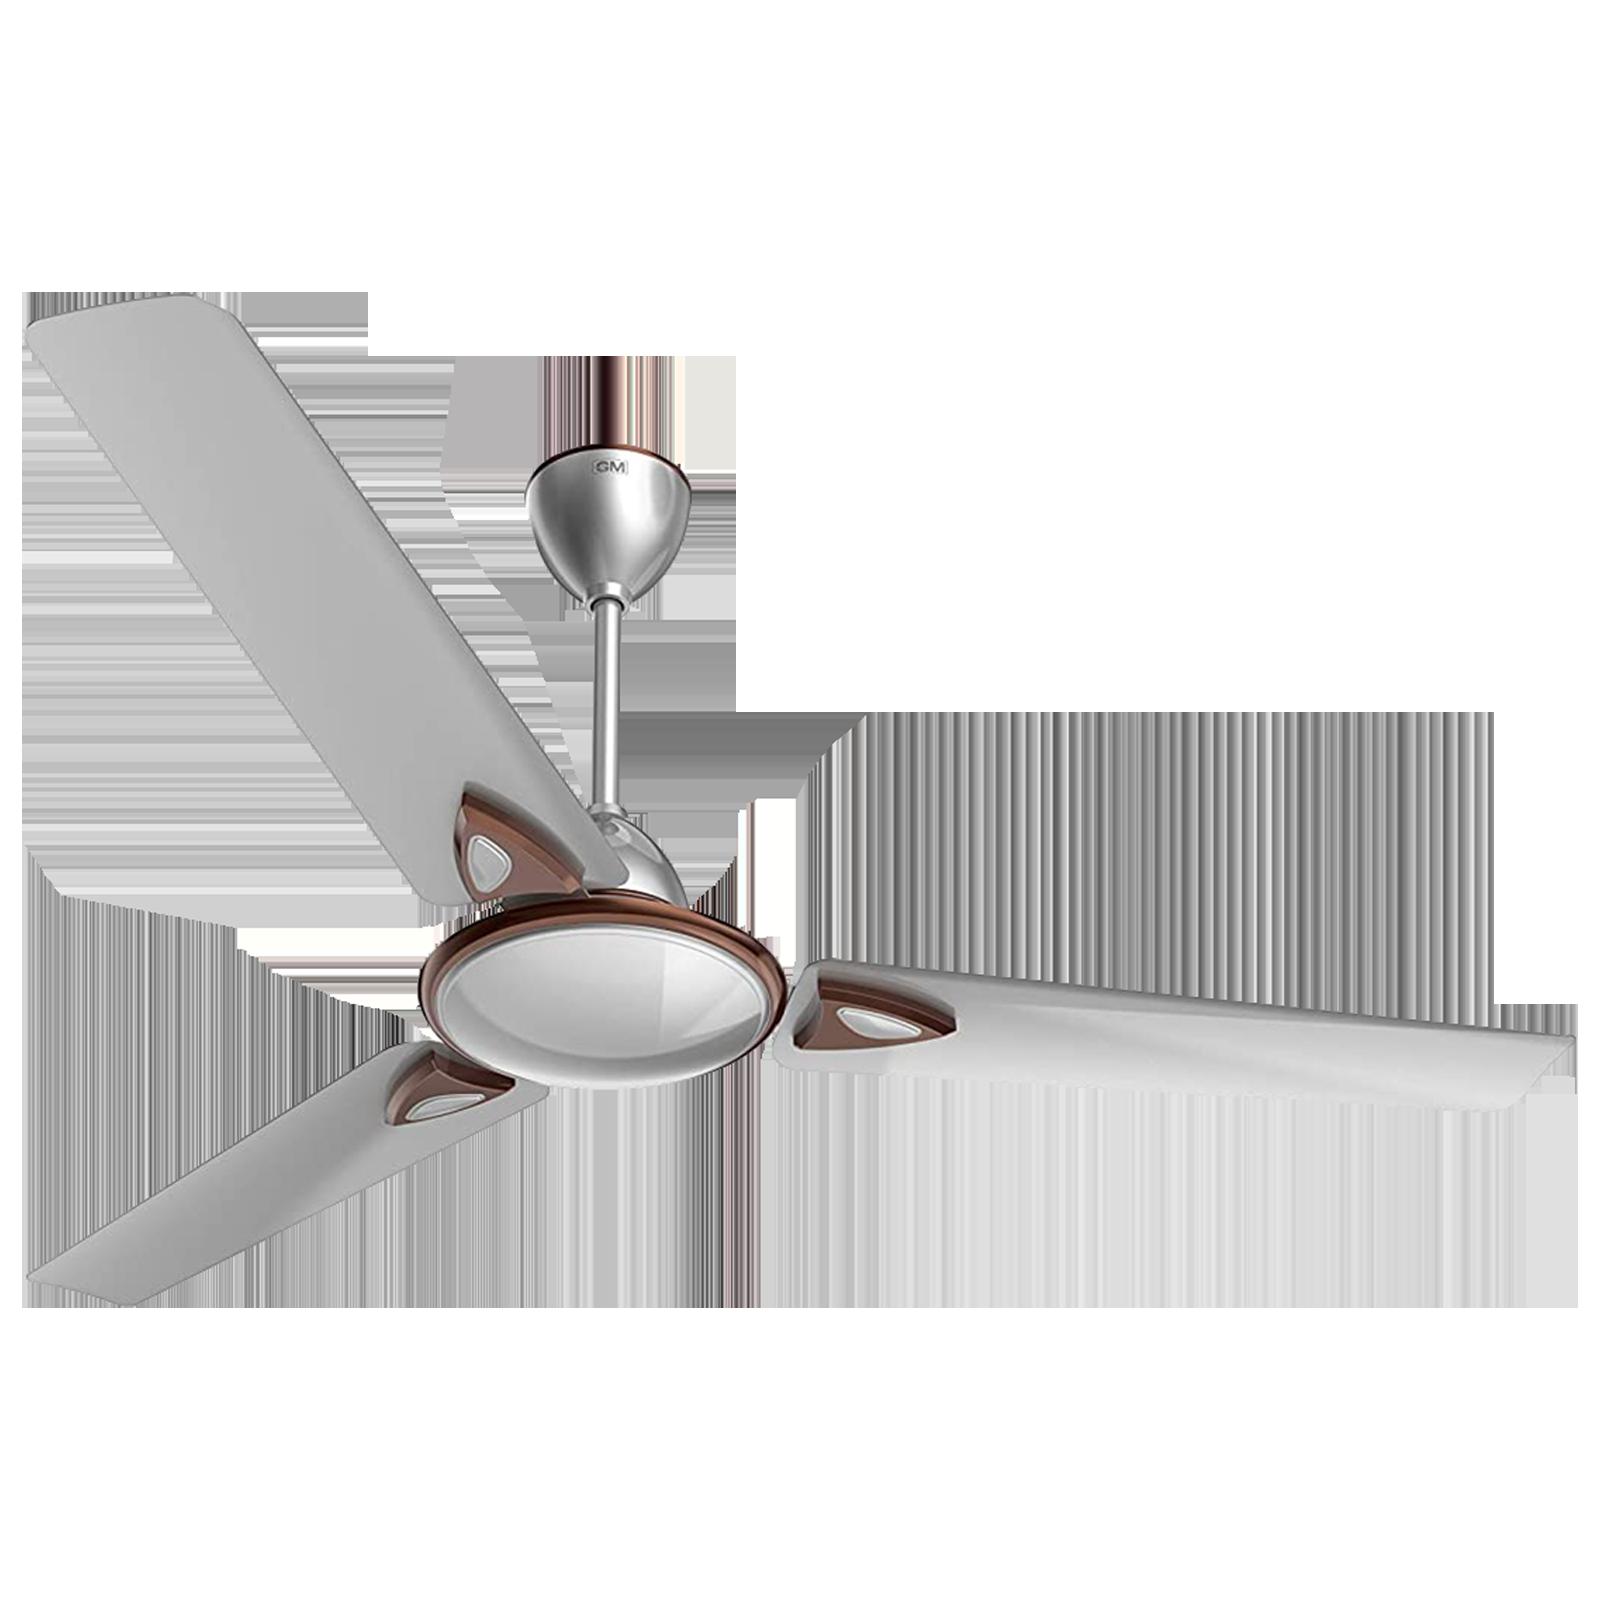 GM Nexa 120 cm Sweep 3 Blade Ceiling Fan (Aerodynamically Designed Blades, CFE480010SLMC, Silver)_1